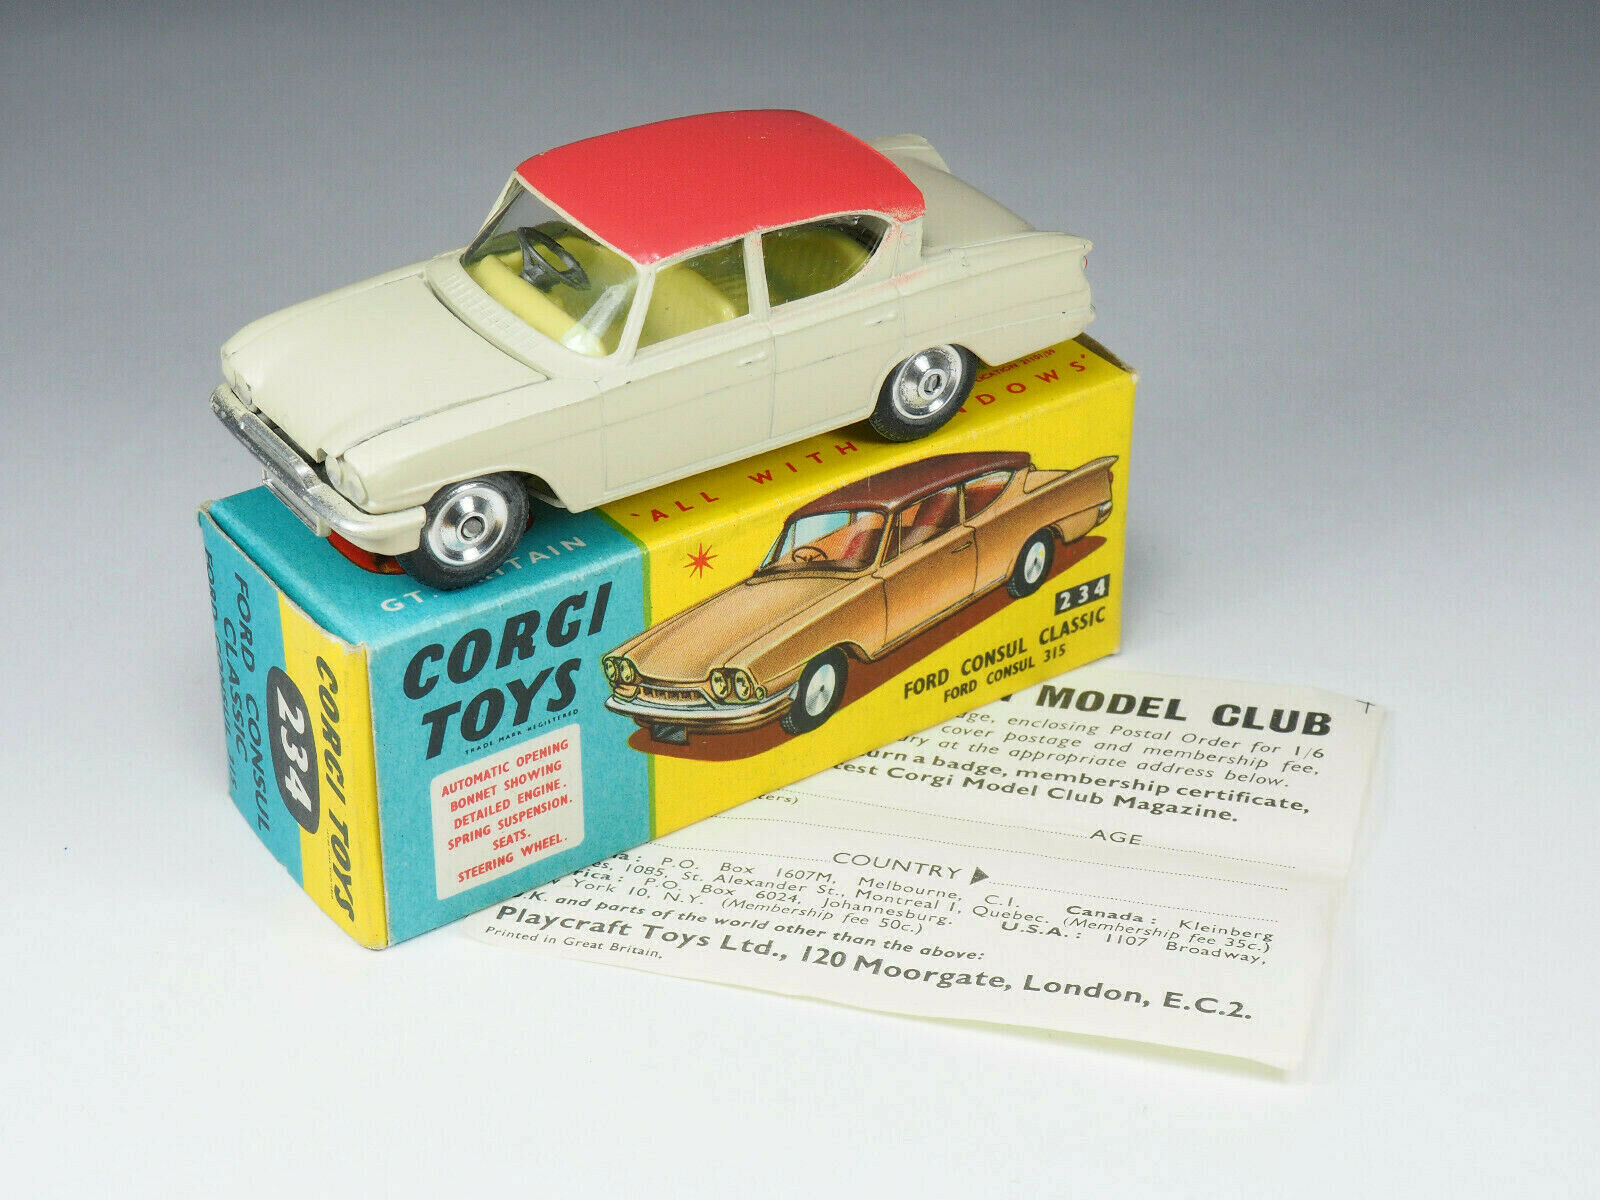 Corgi giocattoli  234  Ford Consul classeic  143e  Engle